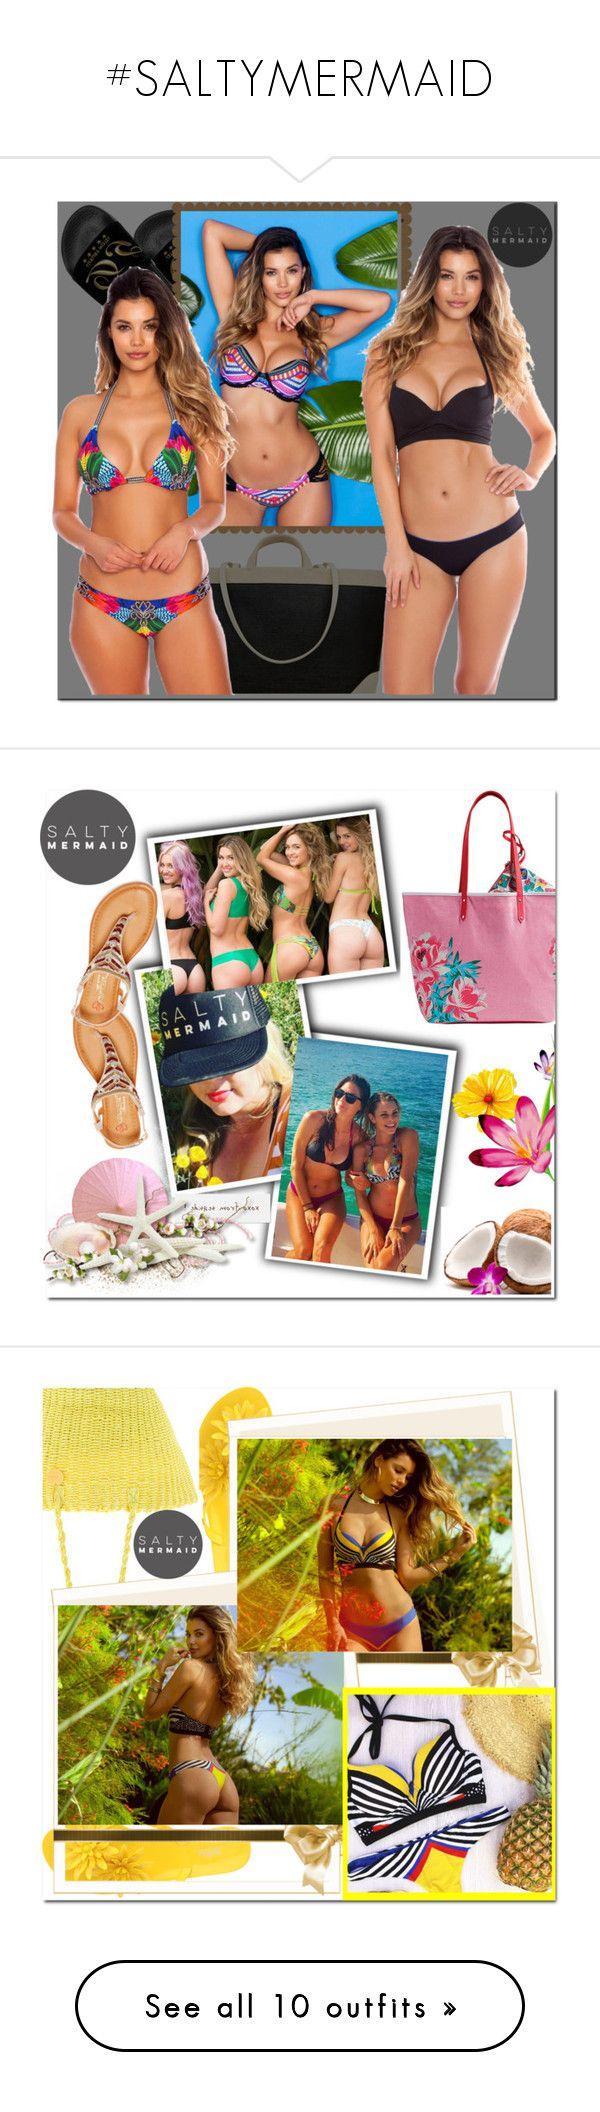 """#SALTYMERMAID"" by fatimka-becirovic ❤ liked on Polyvore featuring Dolce&Gabbana, bikini, swimwear, saltymermaid, DbDk, Vera Bradley, Melissa, Salinas, August Hat and Vionic"